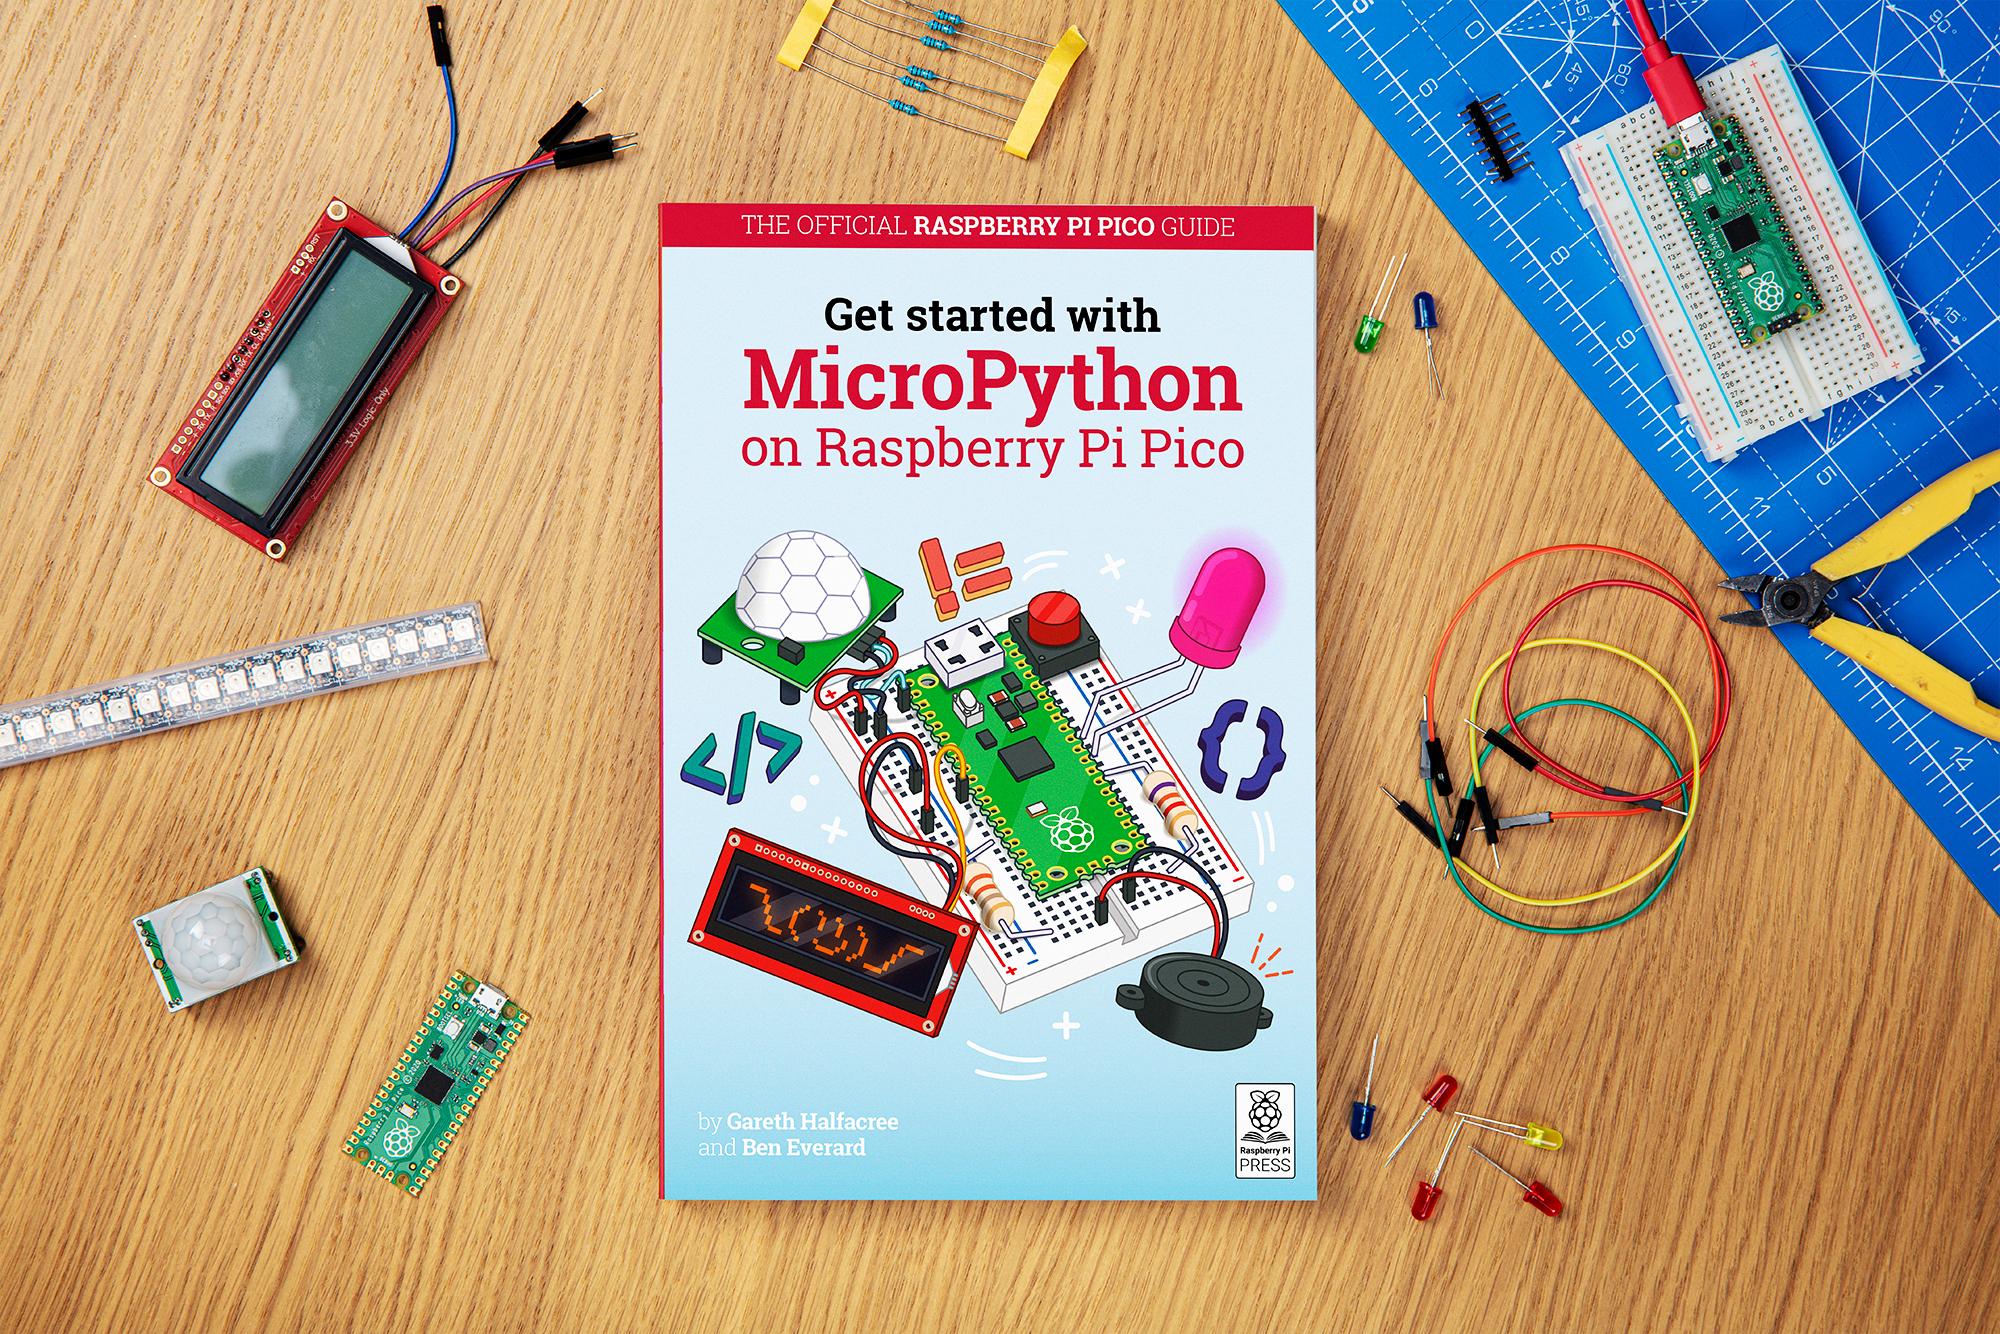 New Book Get Started With Micropython On Raspberry Pi Pico Raspberry Pi